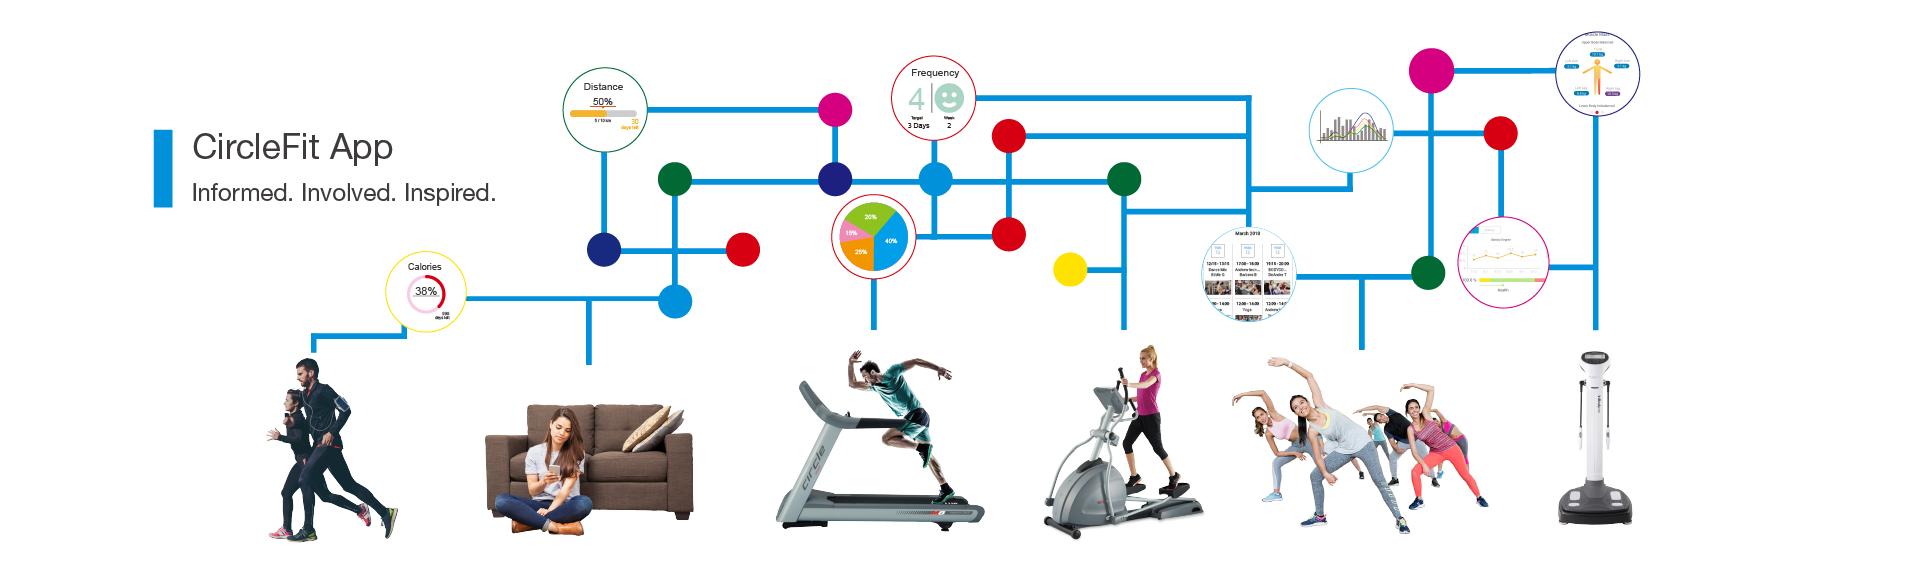 CircleFit App by Circle Fitness